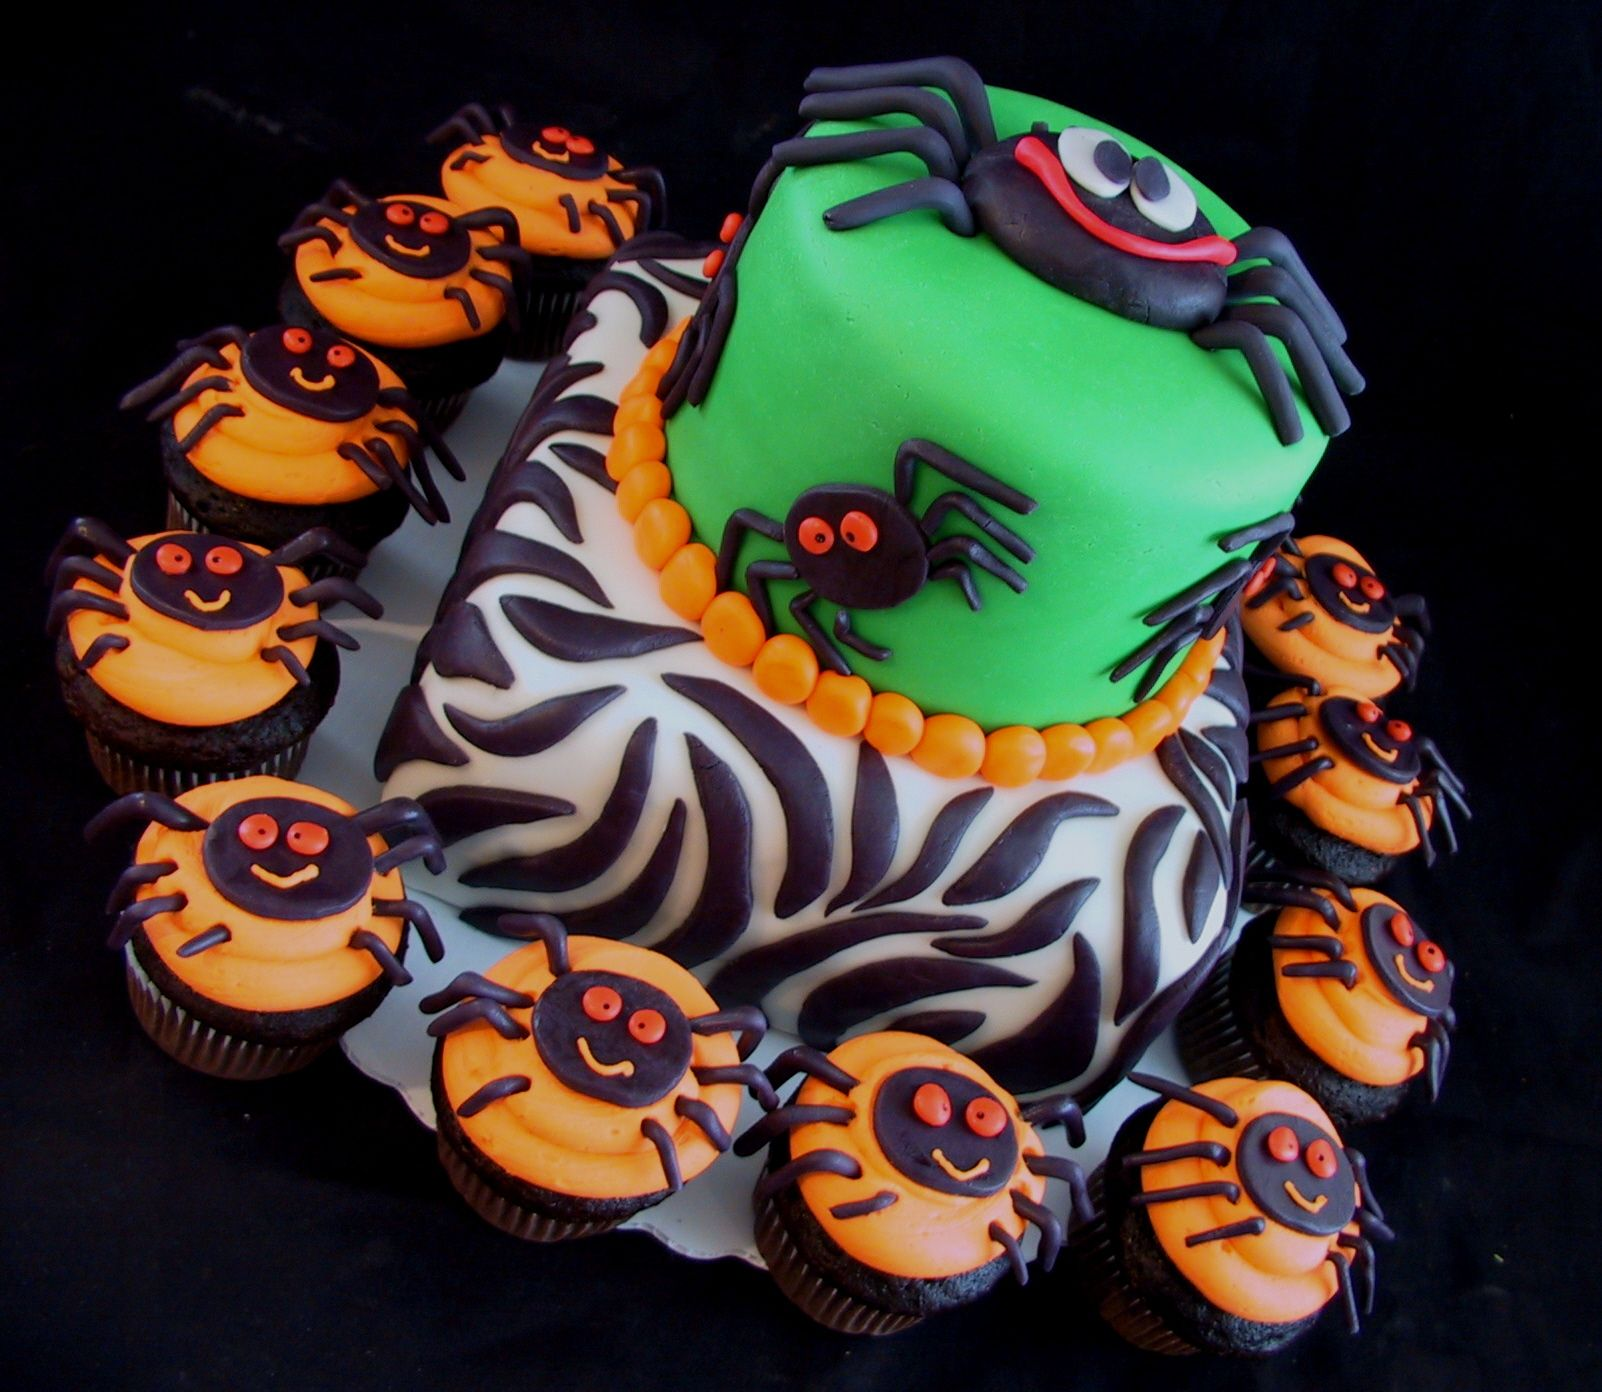 Scary Birthday Cakes